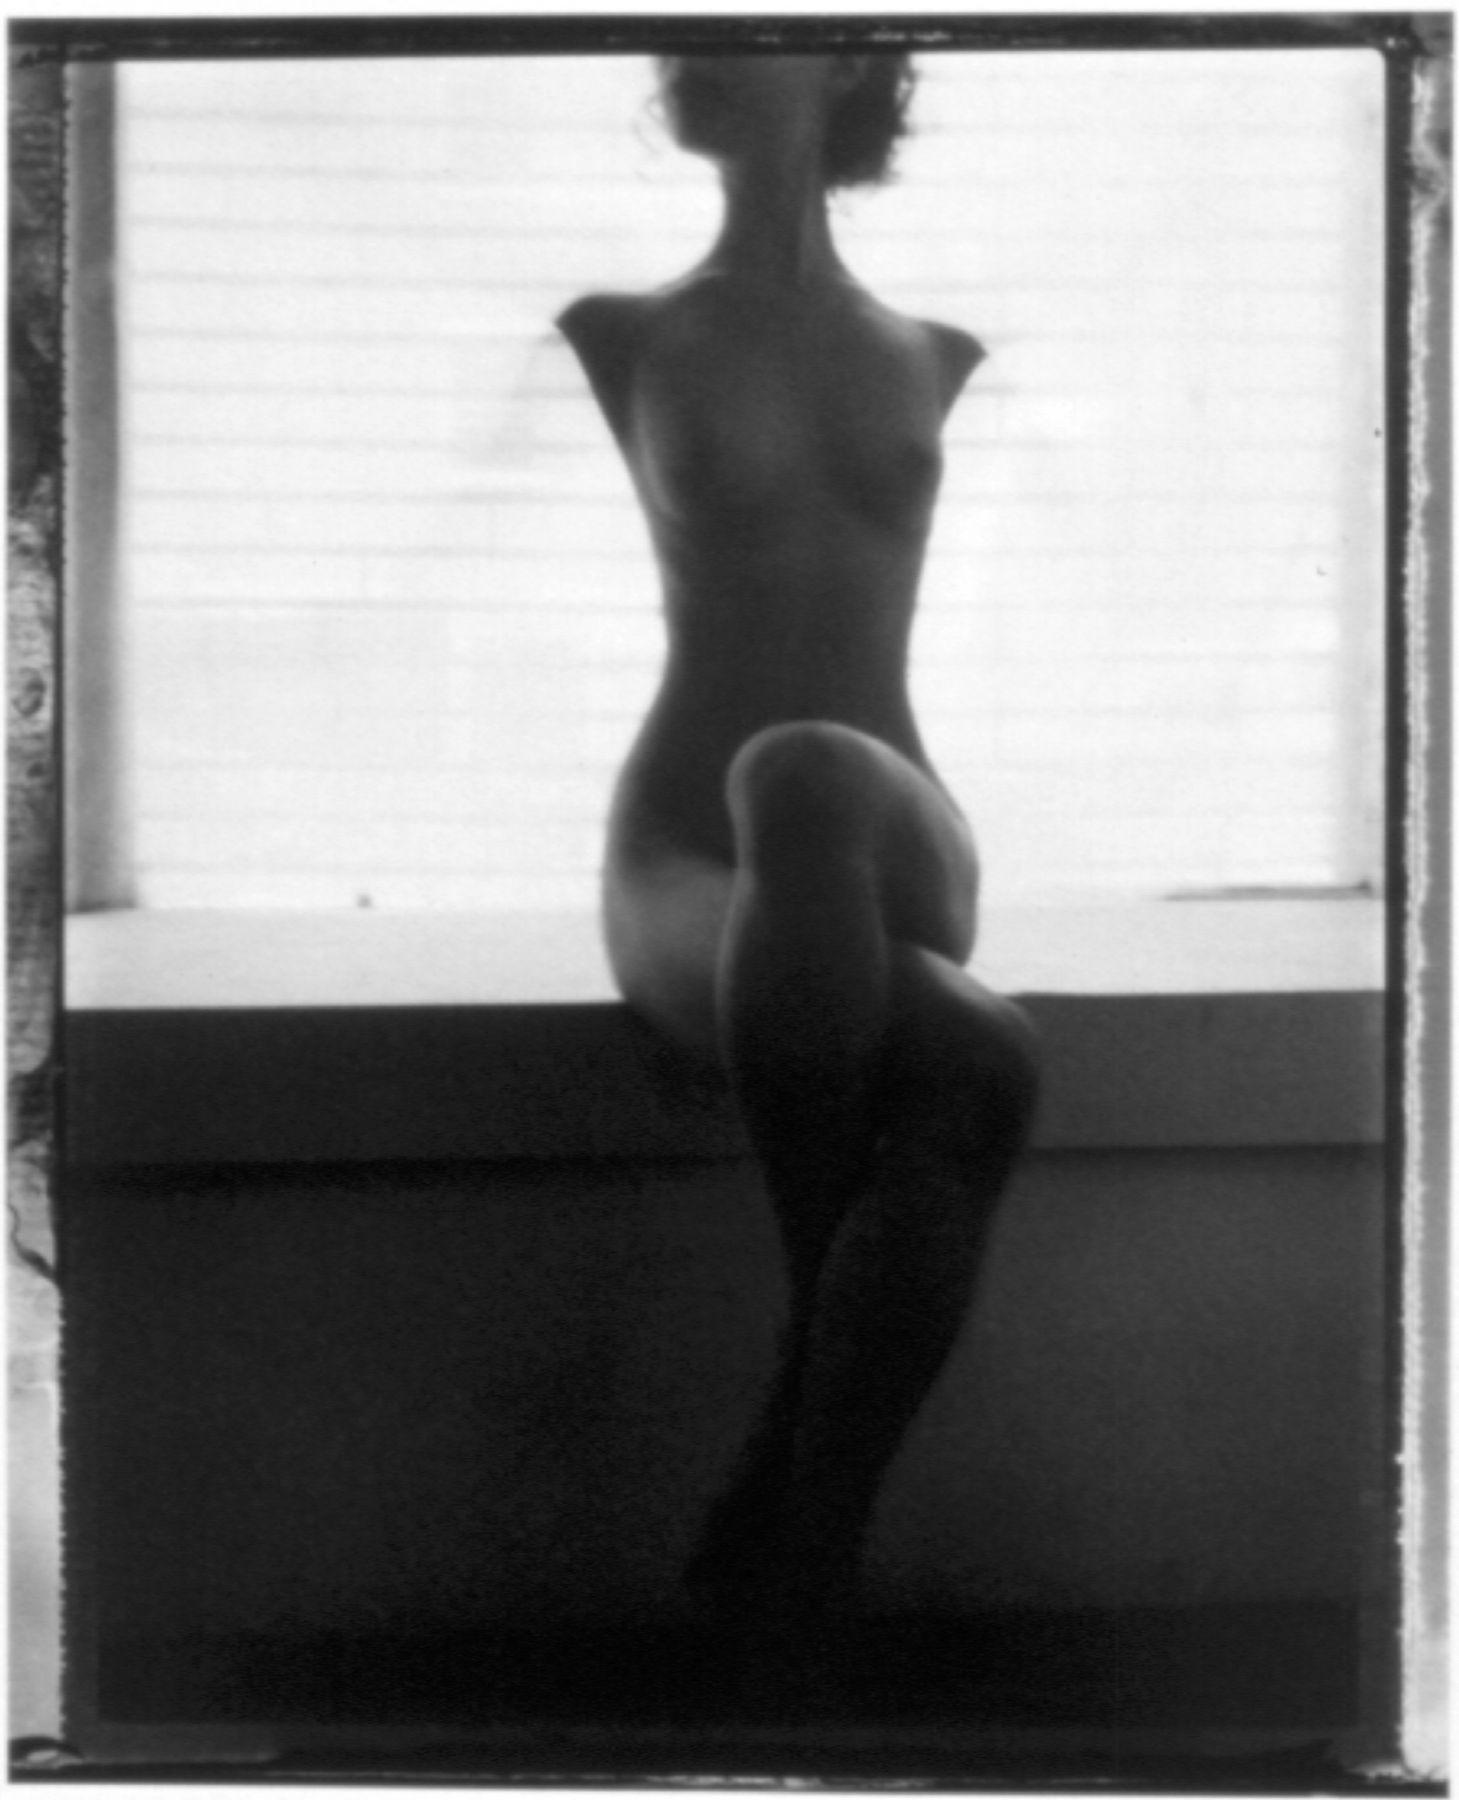 Body of Work, Origin of Simple No.5, Nigel Scott, 1999